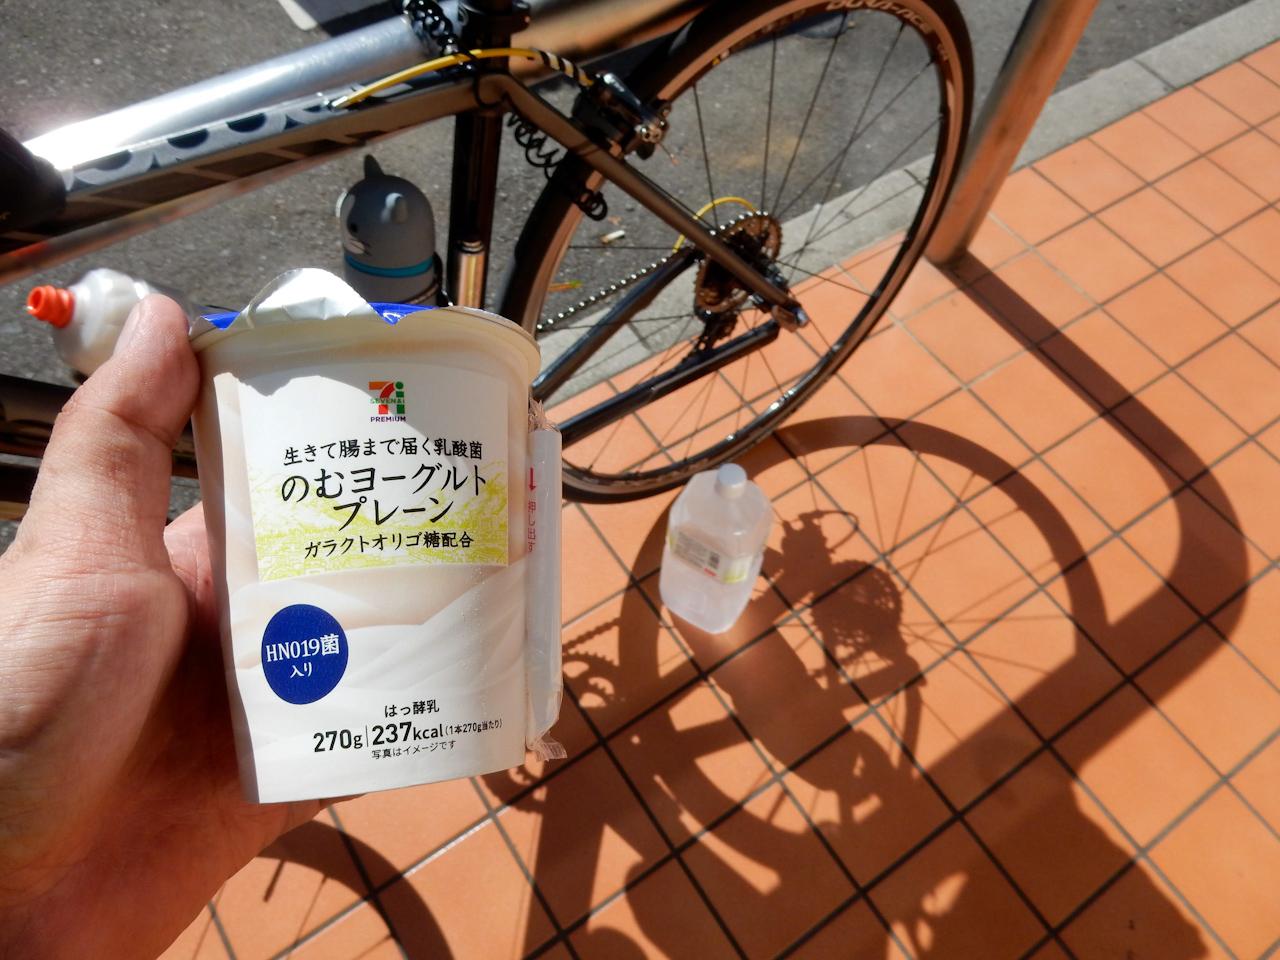 AJたまがわ 2018 BRM1007 奥多摩200k 参加  セブンイレブン福生熊川店